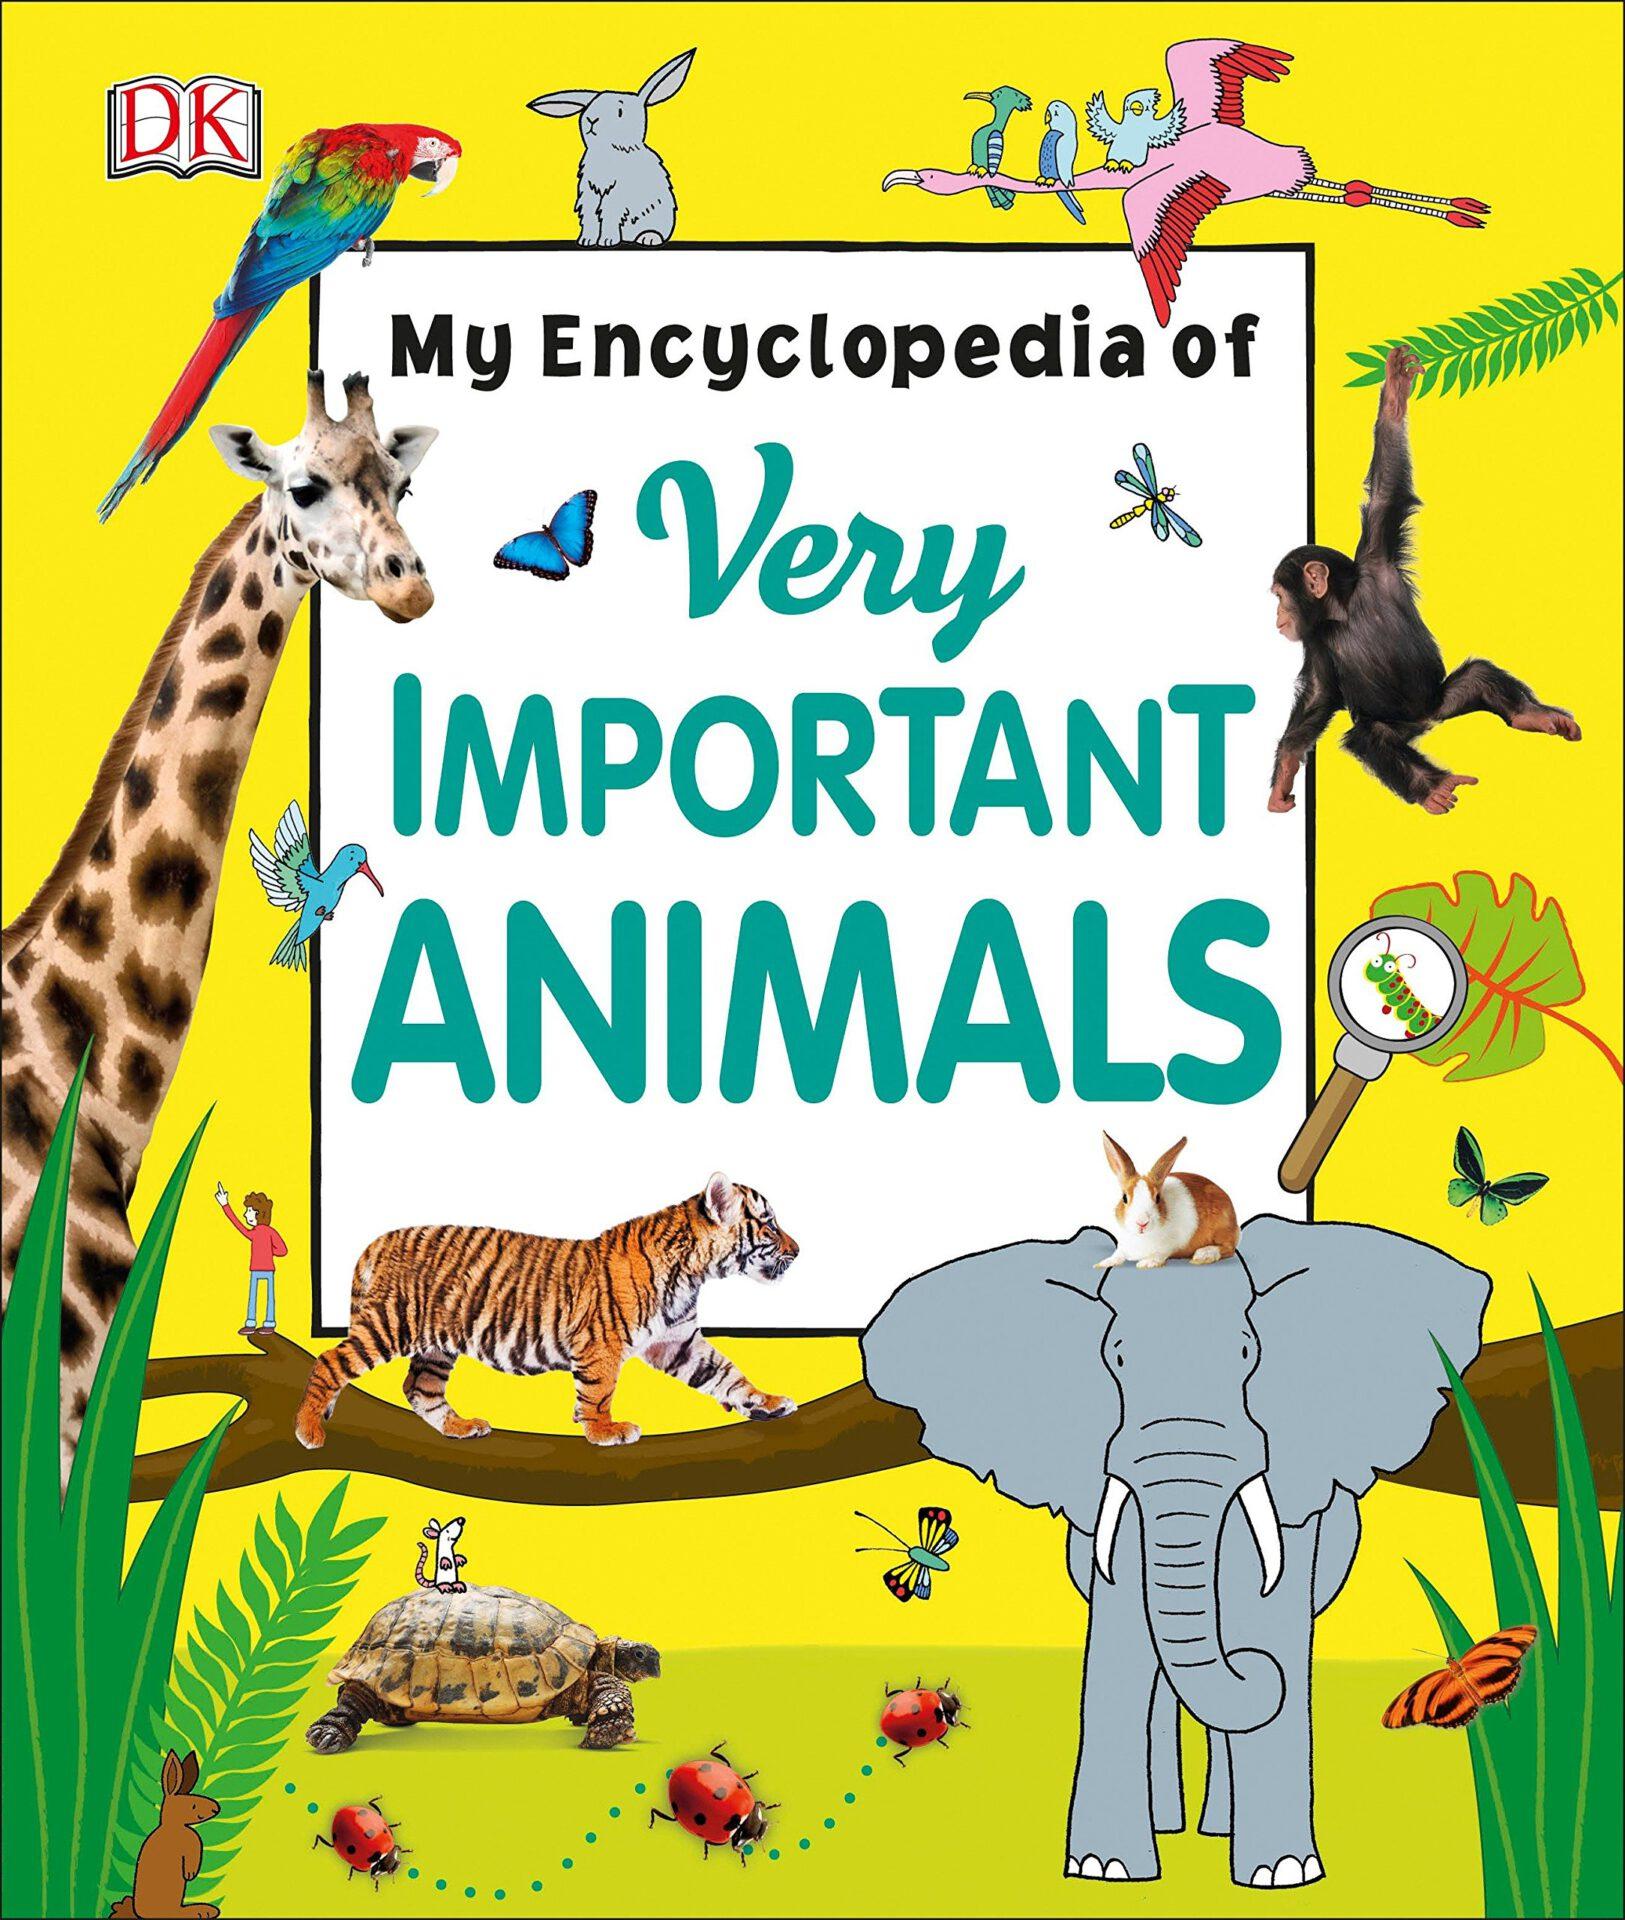 My Encyclopedia of Very Important Animals